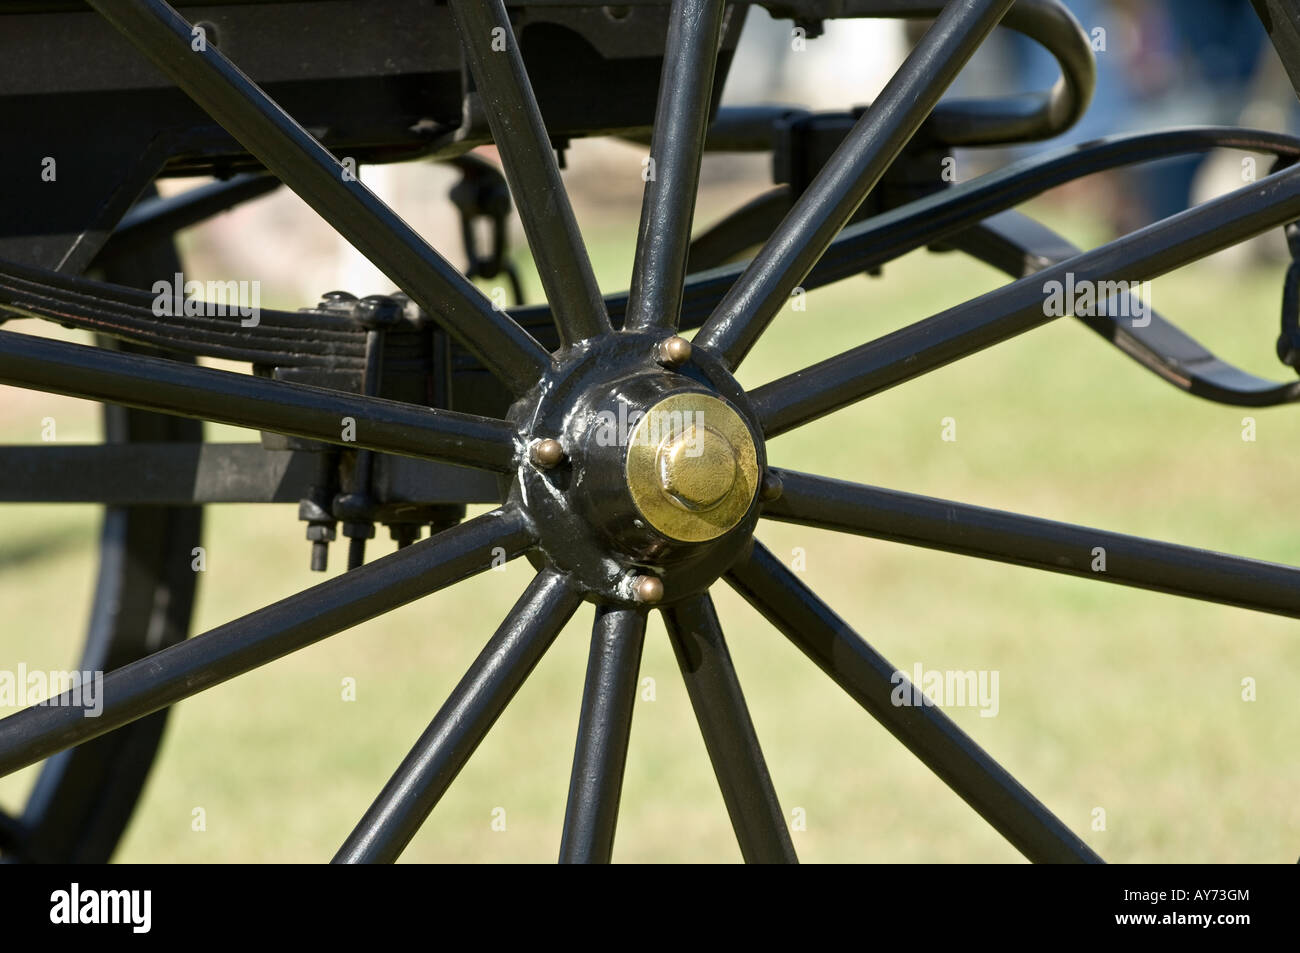 Polished sulky wheel - Stock Image